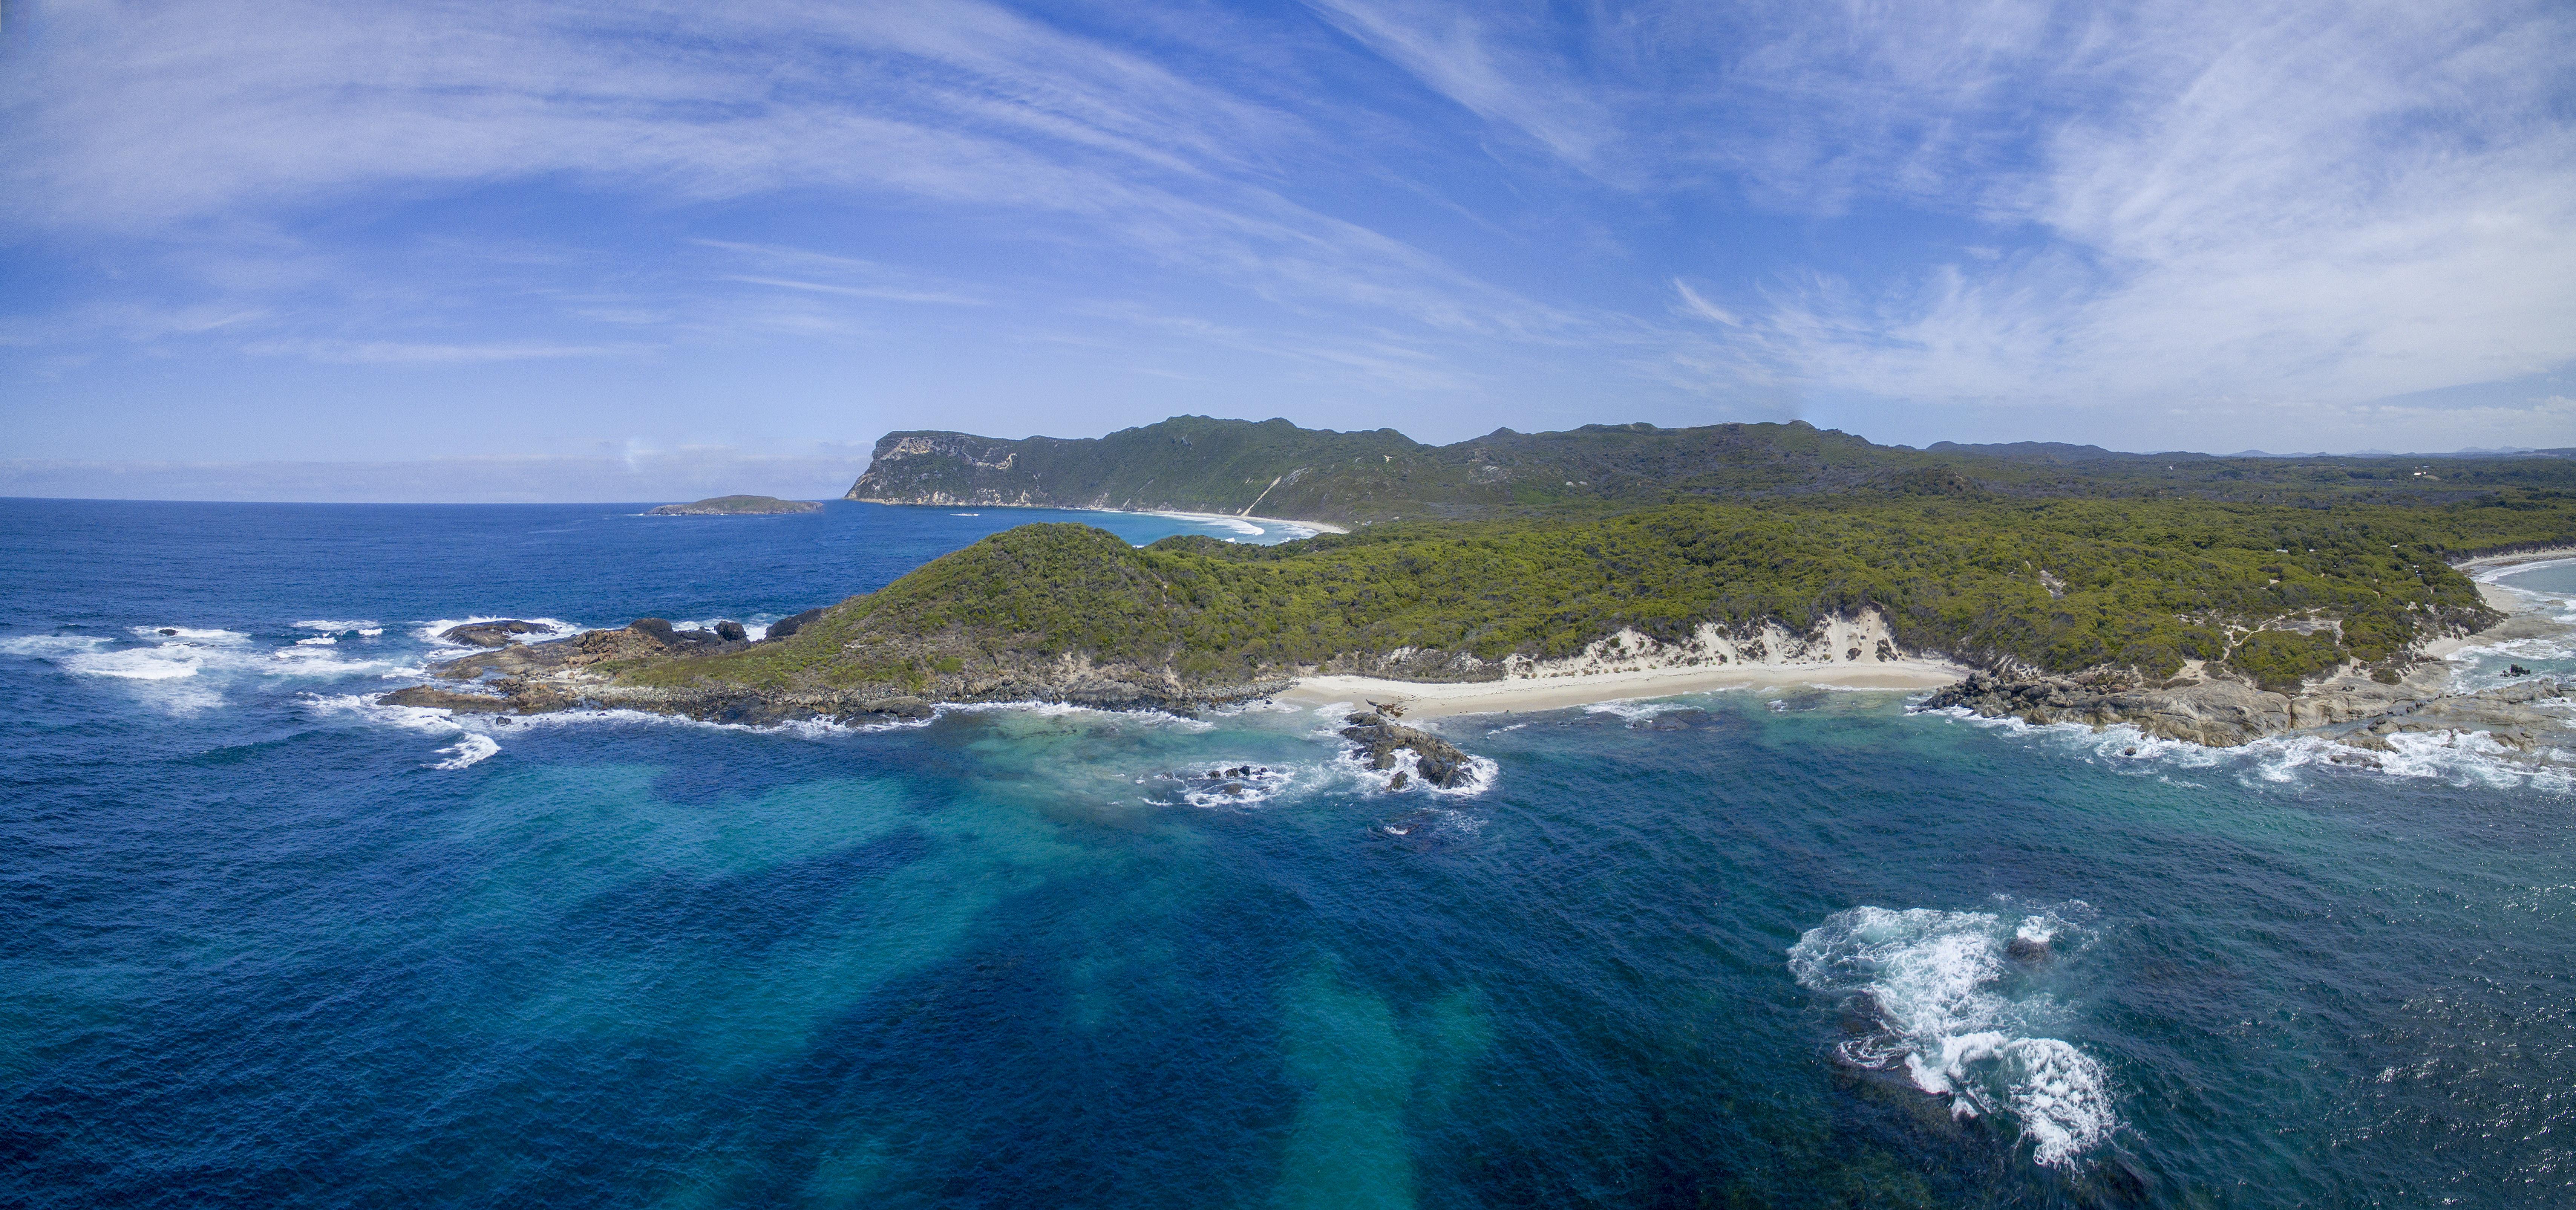 Parrys Beach Rocks